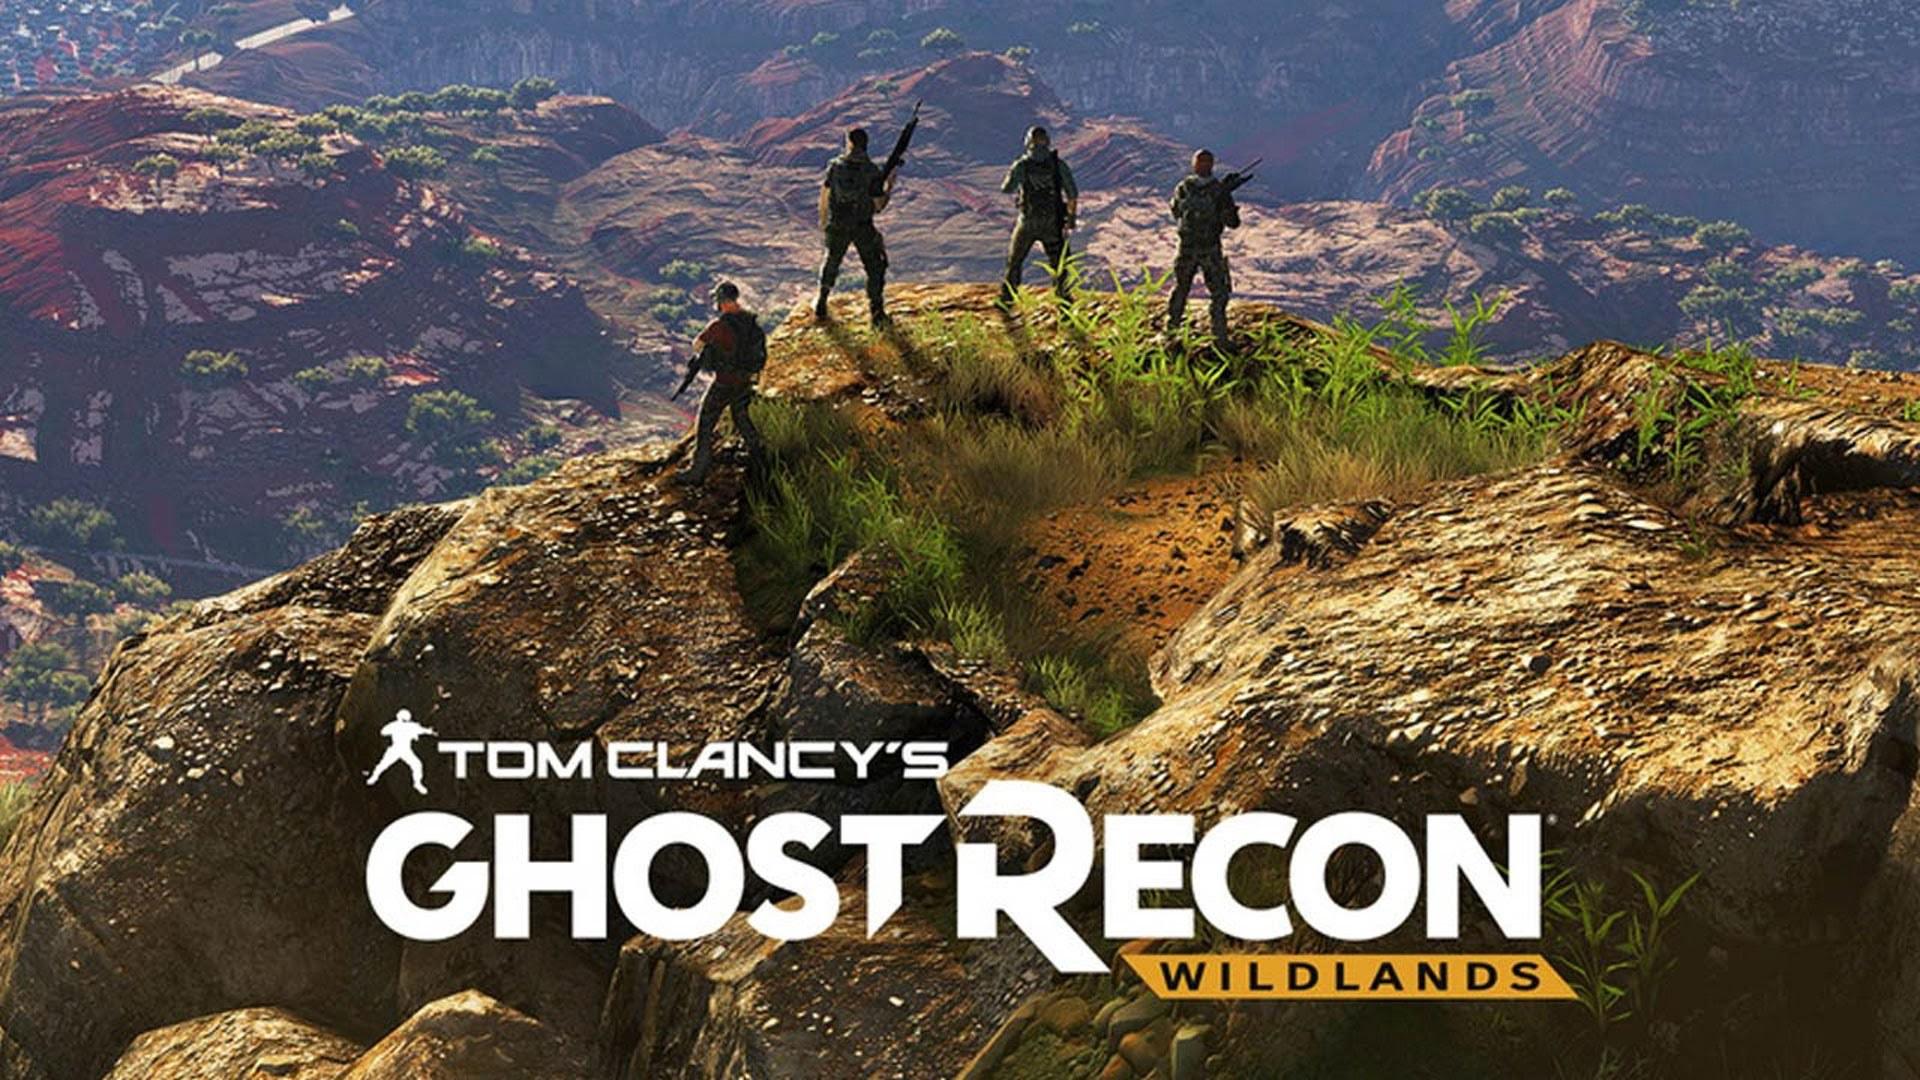 Tom Clancy's Ghost Recon Wildlands Computer Wallpaper